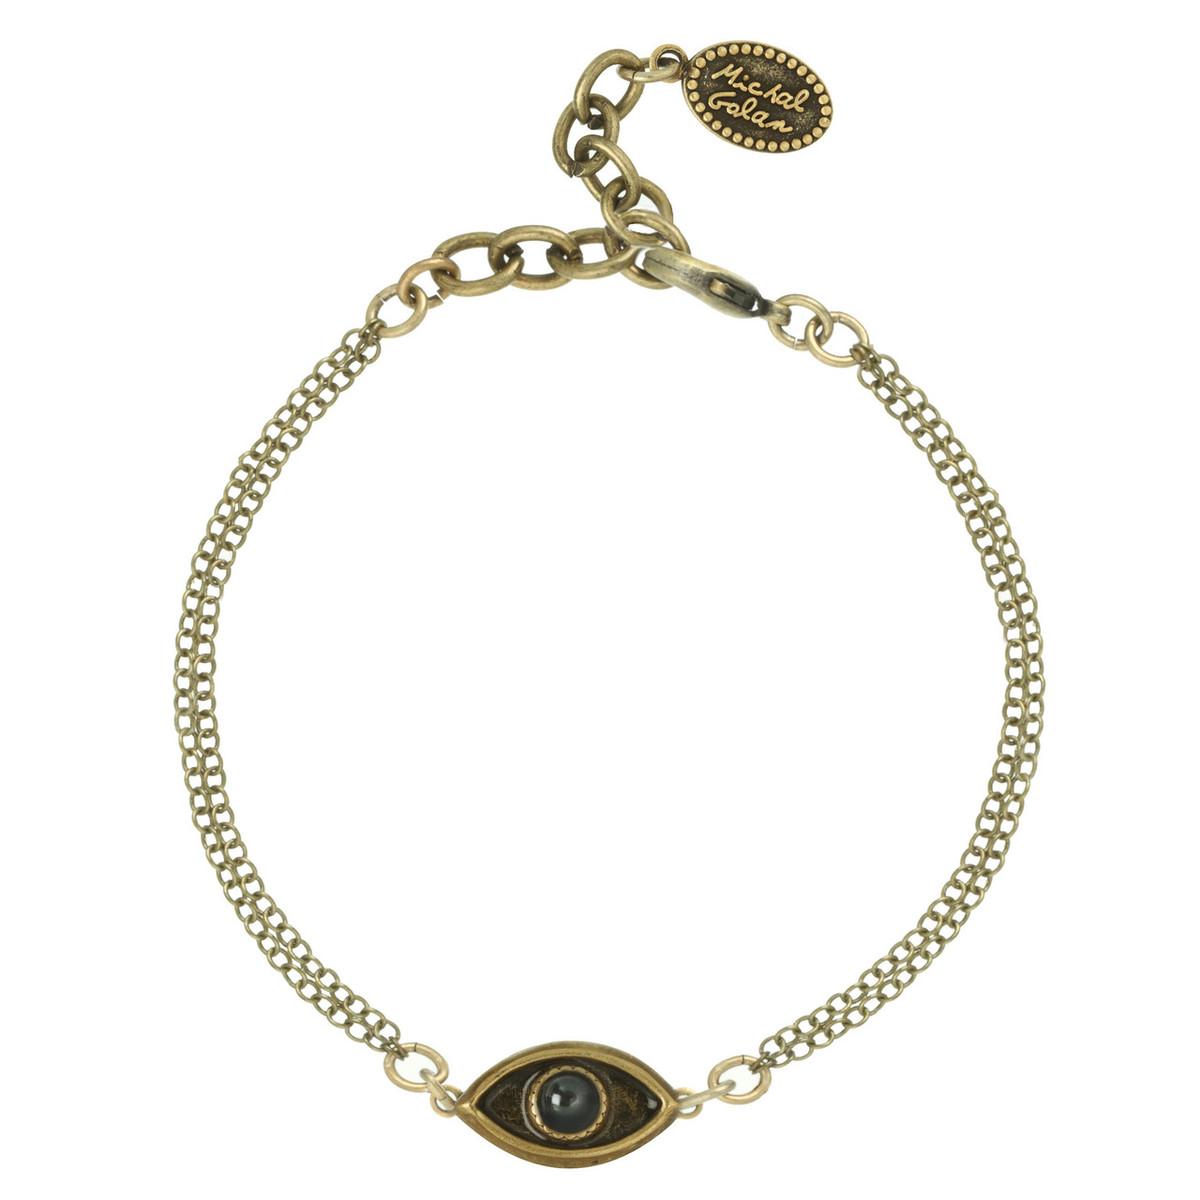 Michal Golan Jewelry Evil Eye with Hematite Center Gold Bracelet